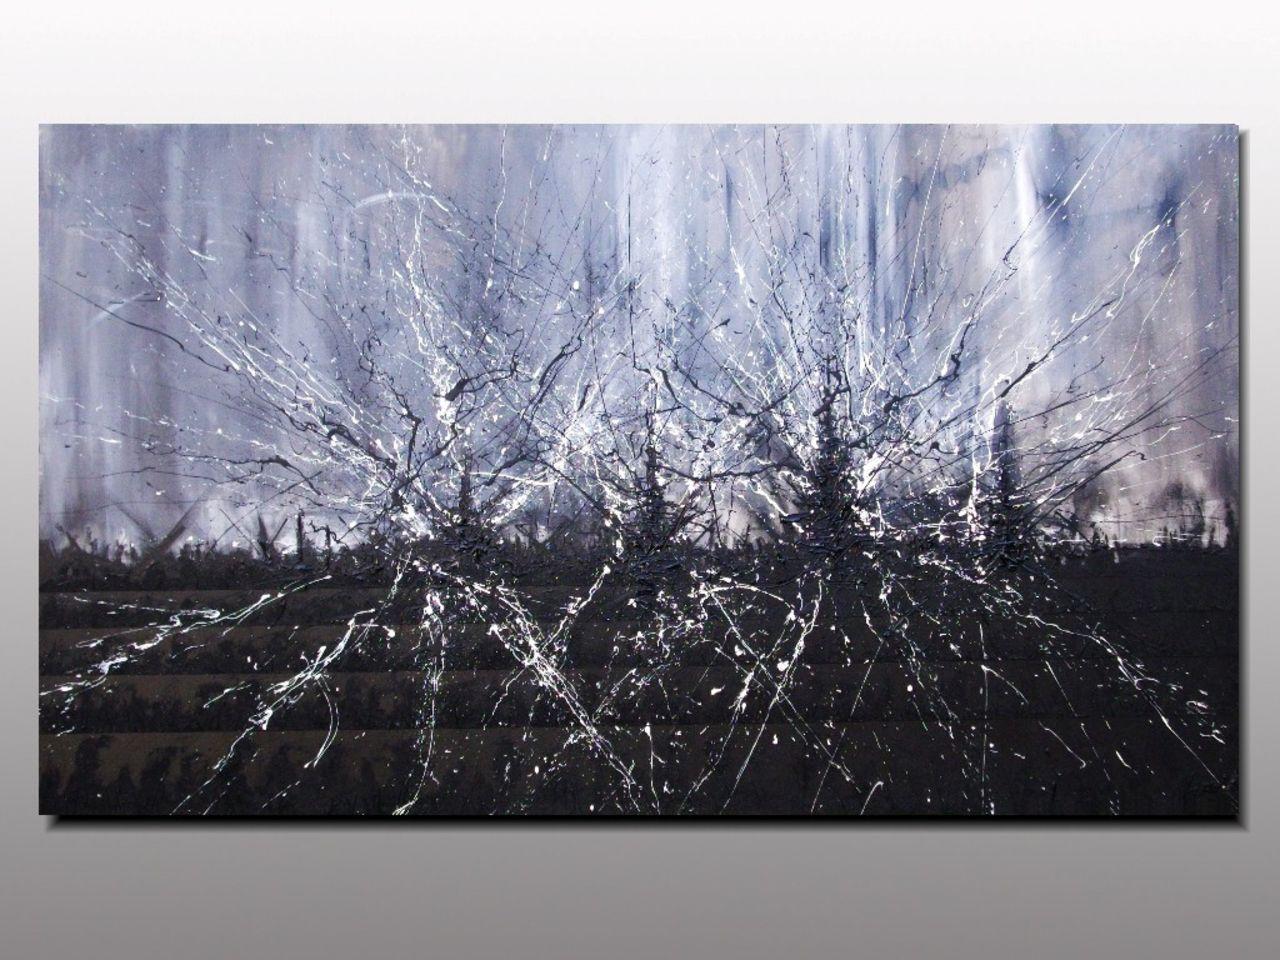 LEPOLSK MATUSZEWSKI IDYLLIC DISASTER  expressionnisme abstrait  action painting dripping tubbing relief artiste peintre plasticien Lepolsk Matuszews